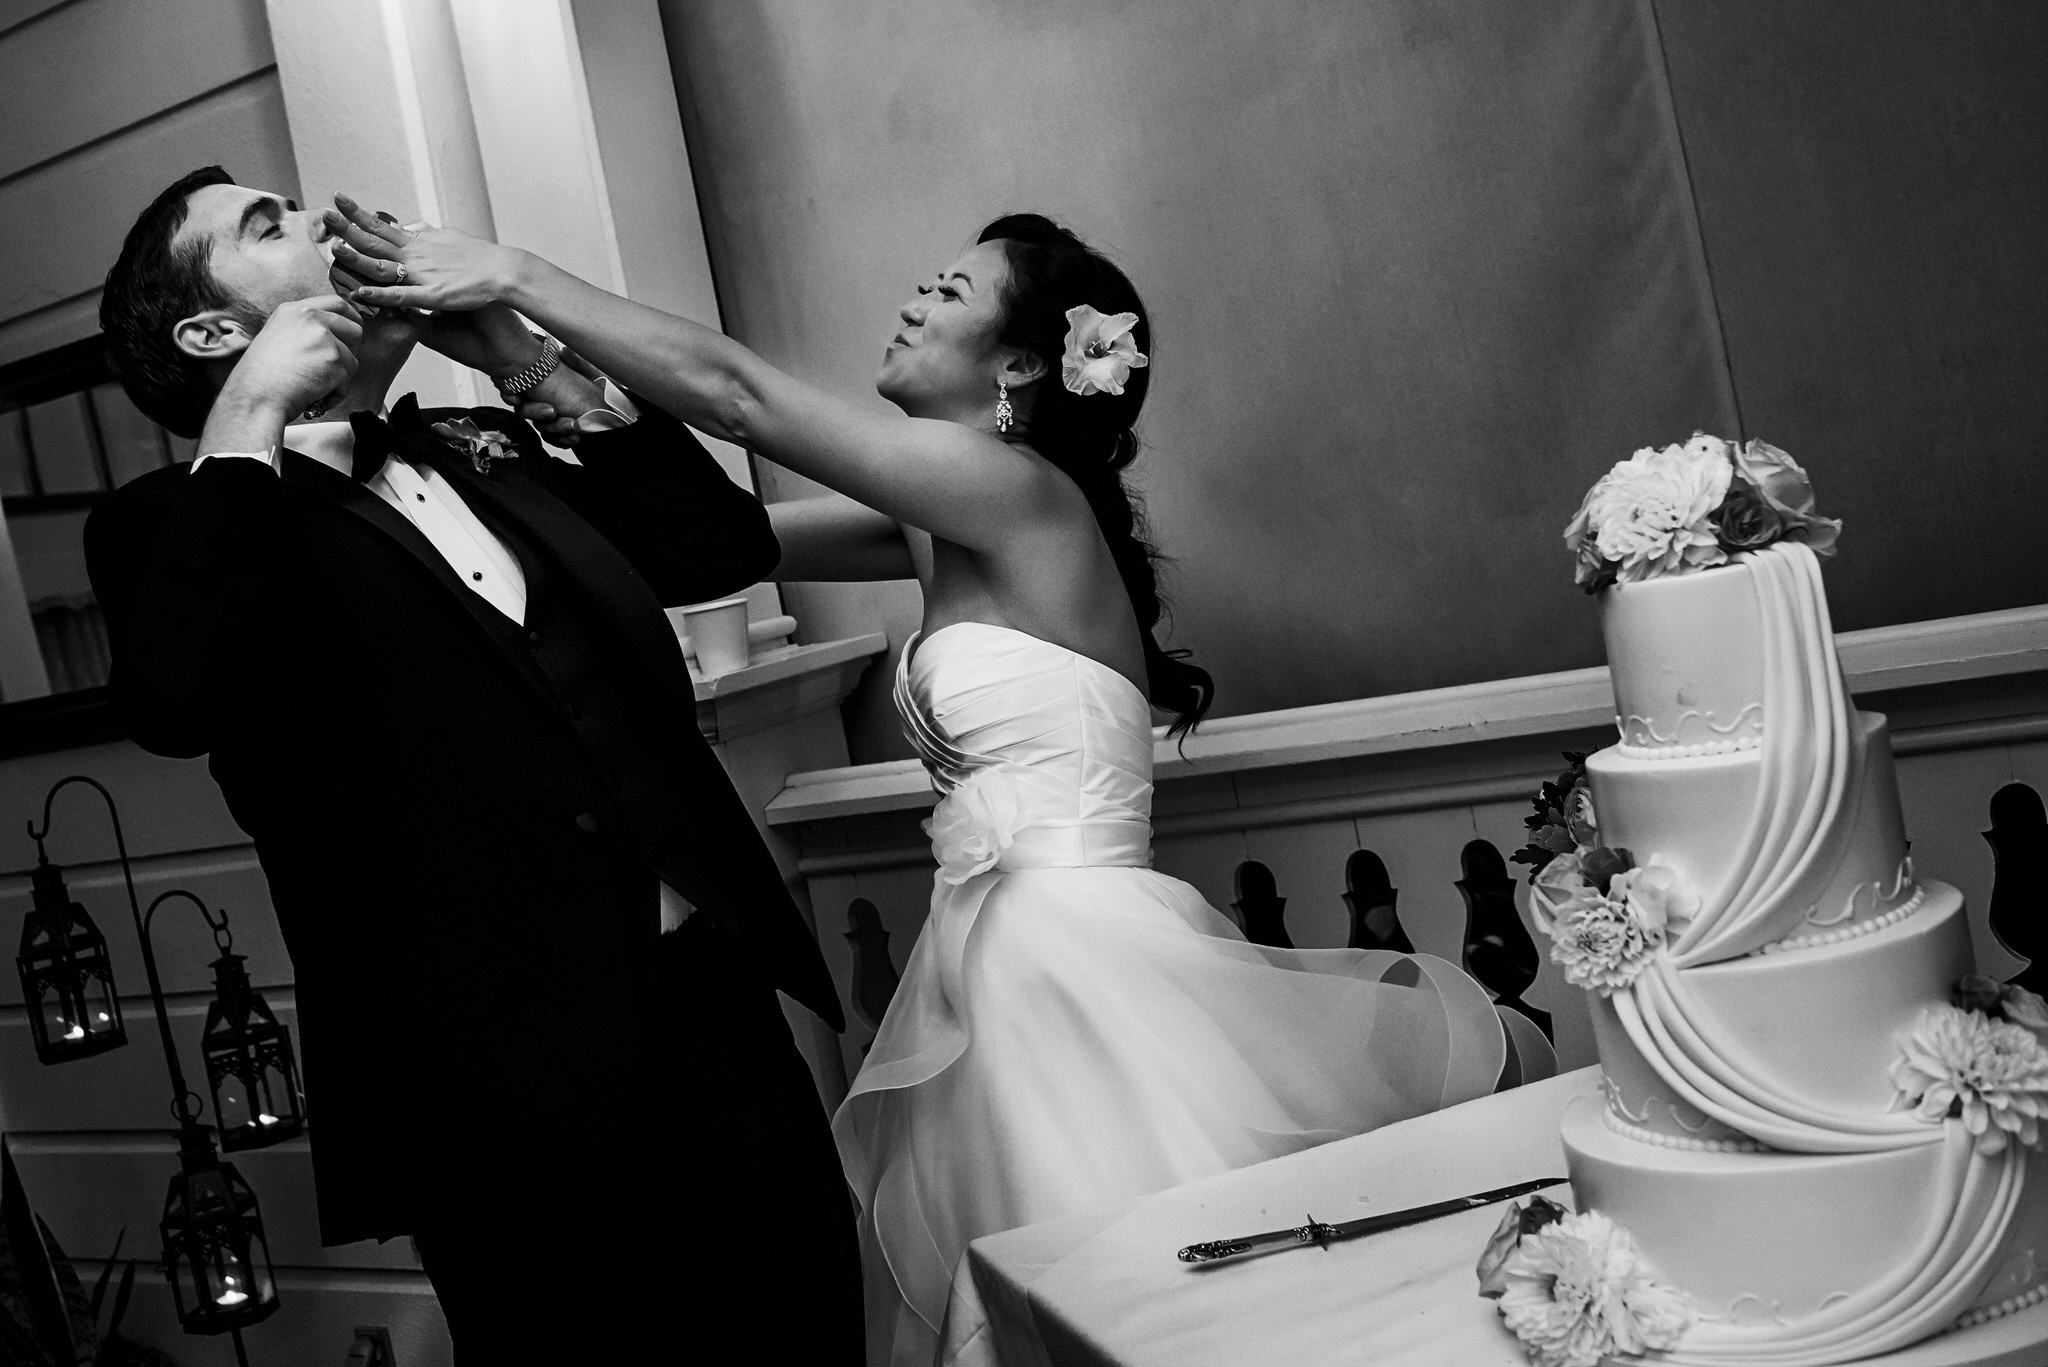 Hae-Jin & Bobby' s wedding at Madrona Manor in Healdsburg, CA